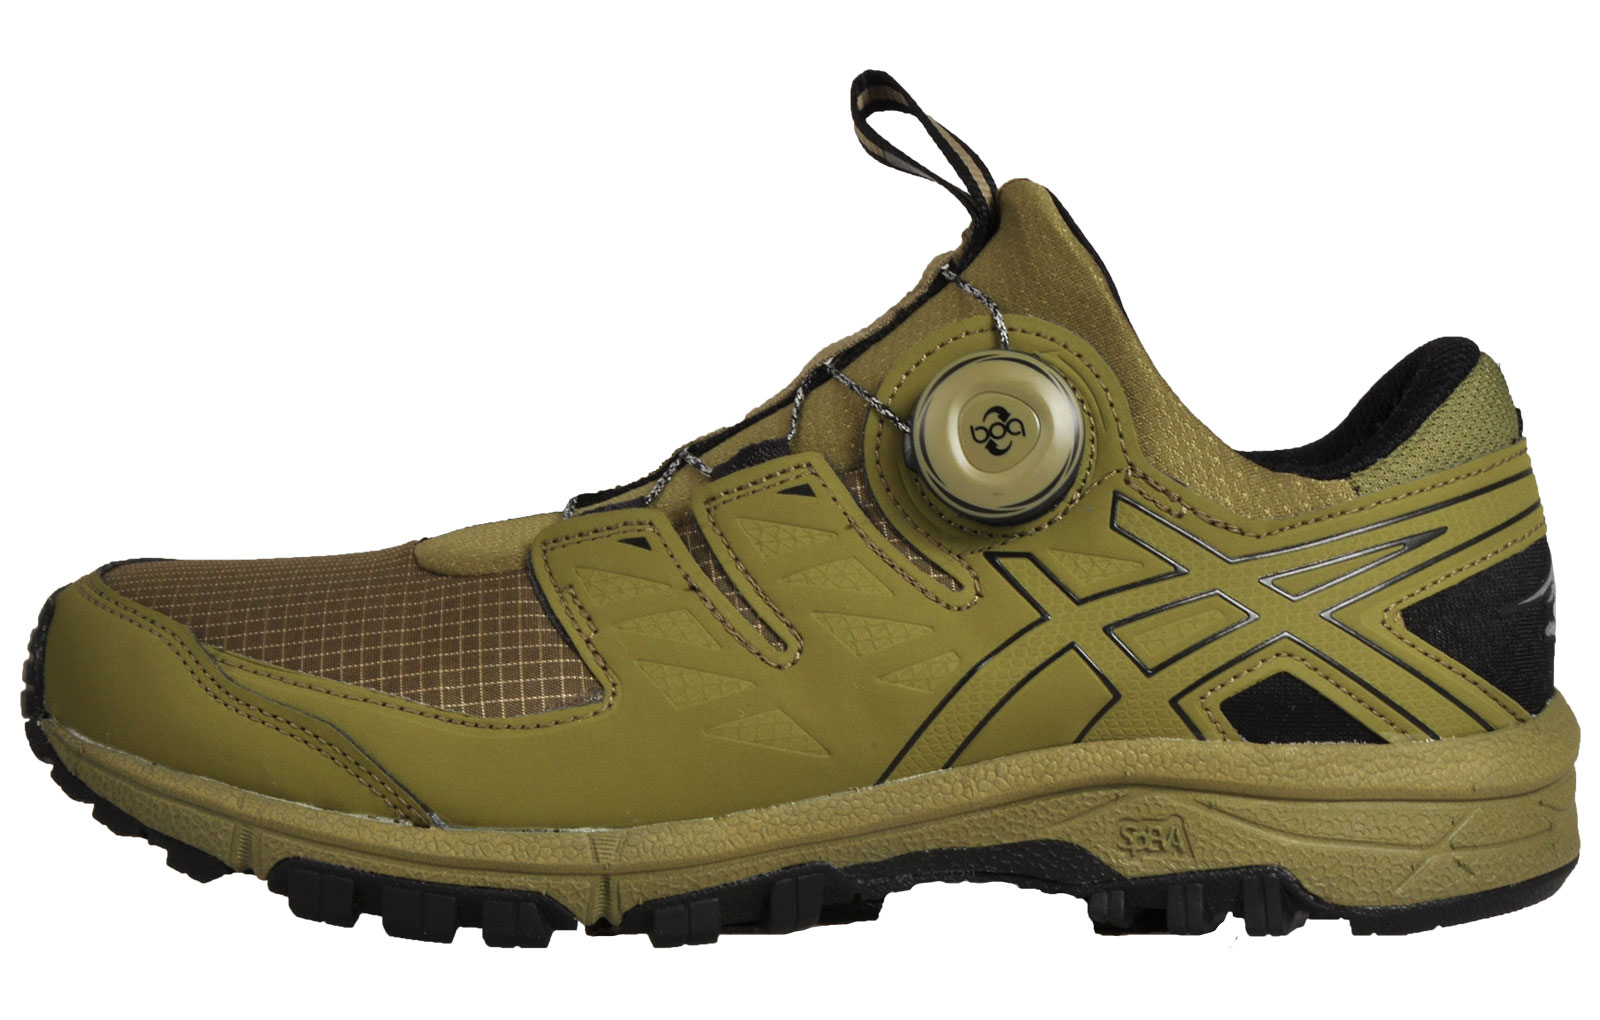 Ebay Asics Running Shoes